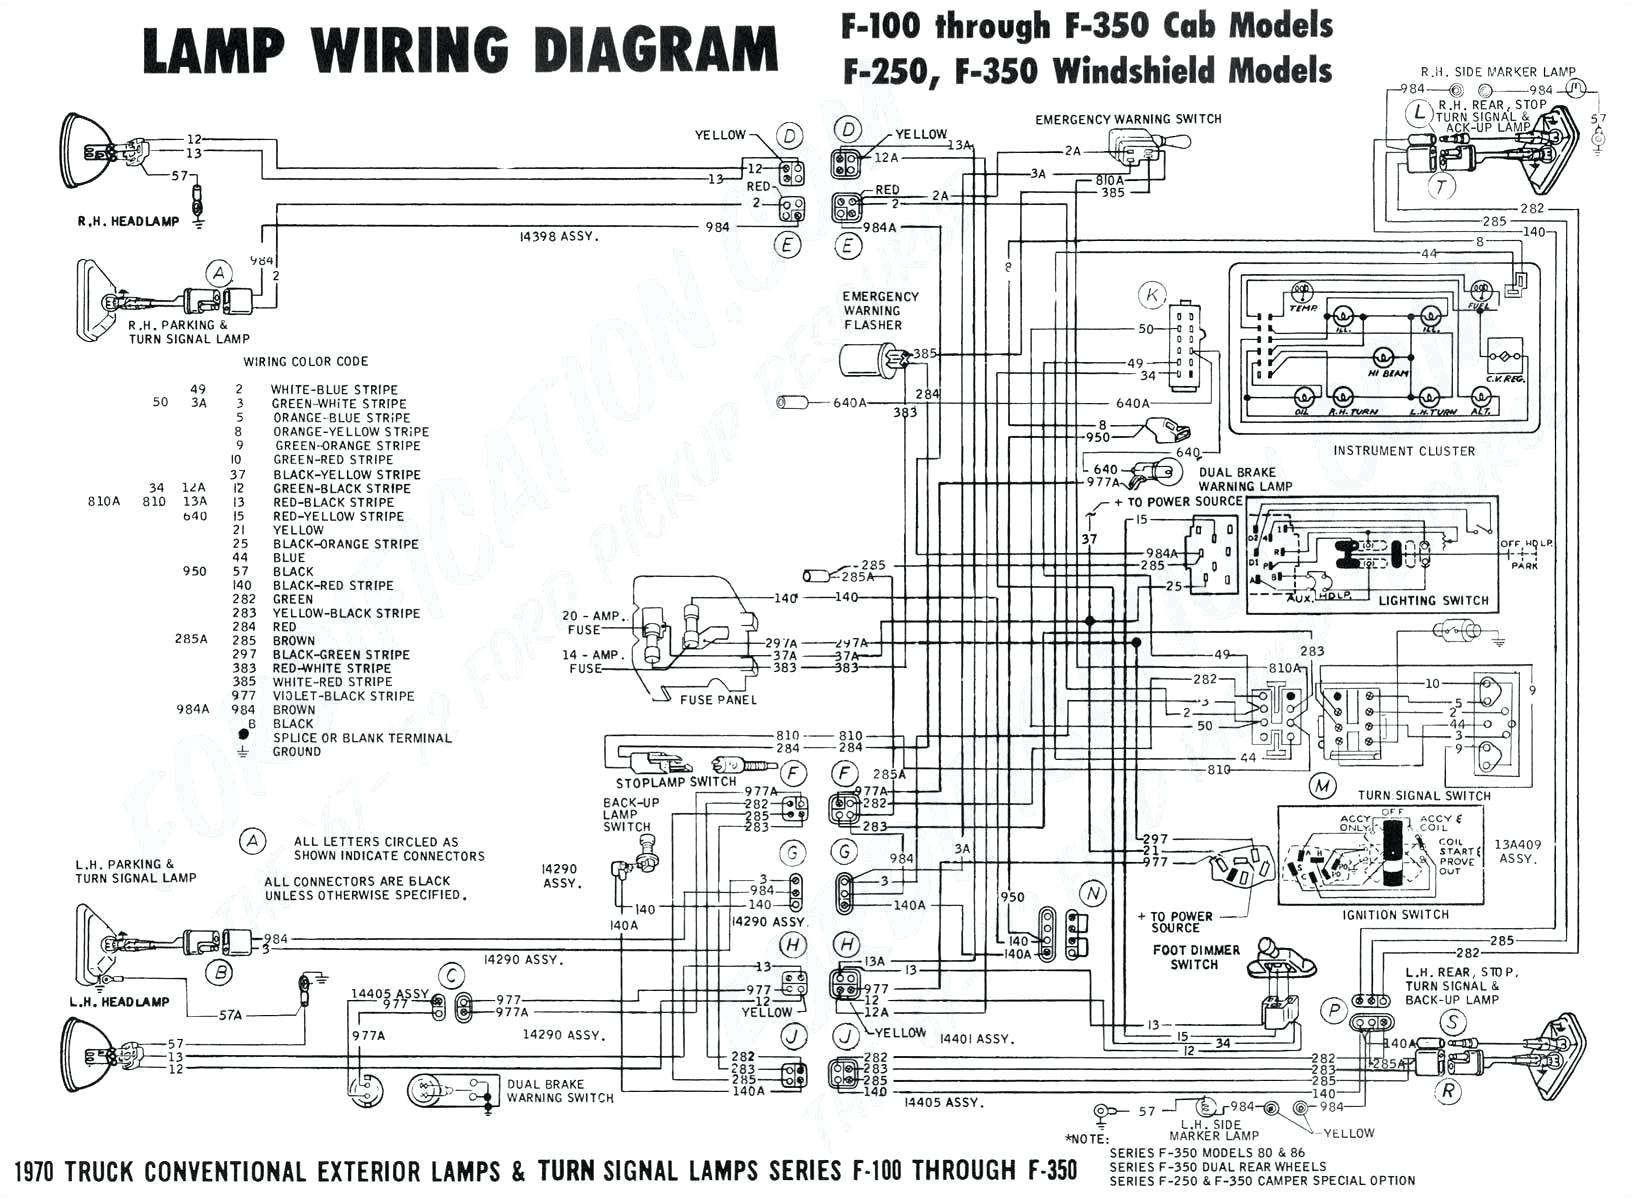 Kenwood Dnx5140 Wiring Diagram 2010 ford E 450 6 0l Engine Diagram Wiring Diagram Database